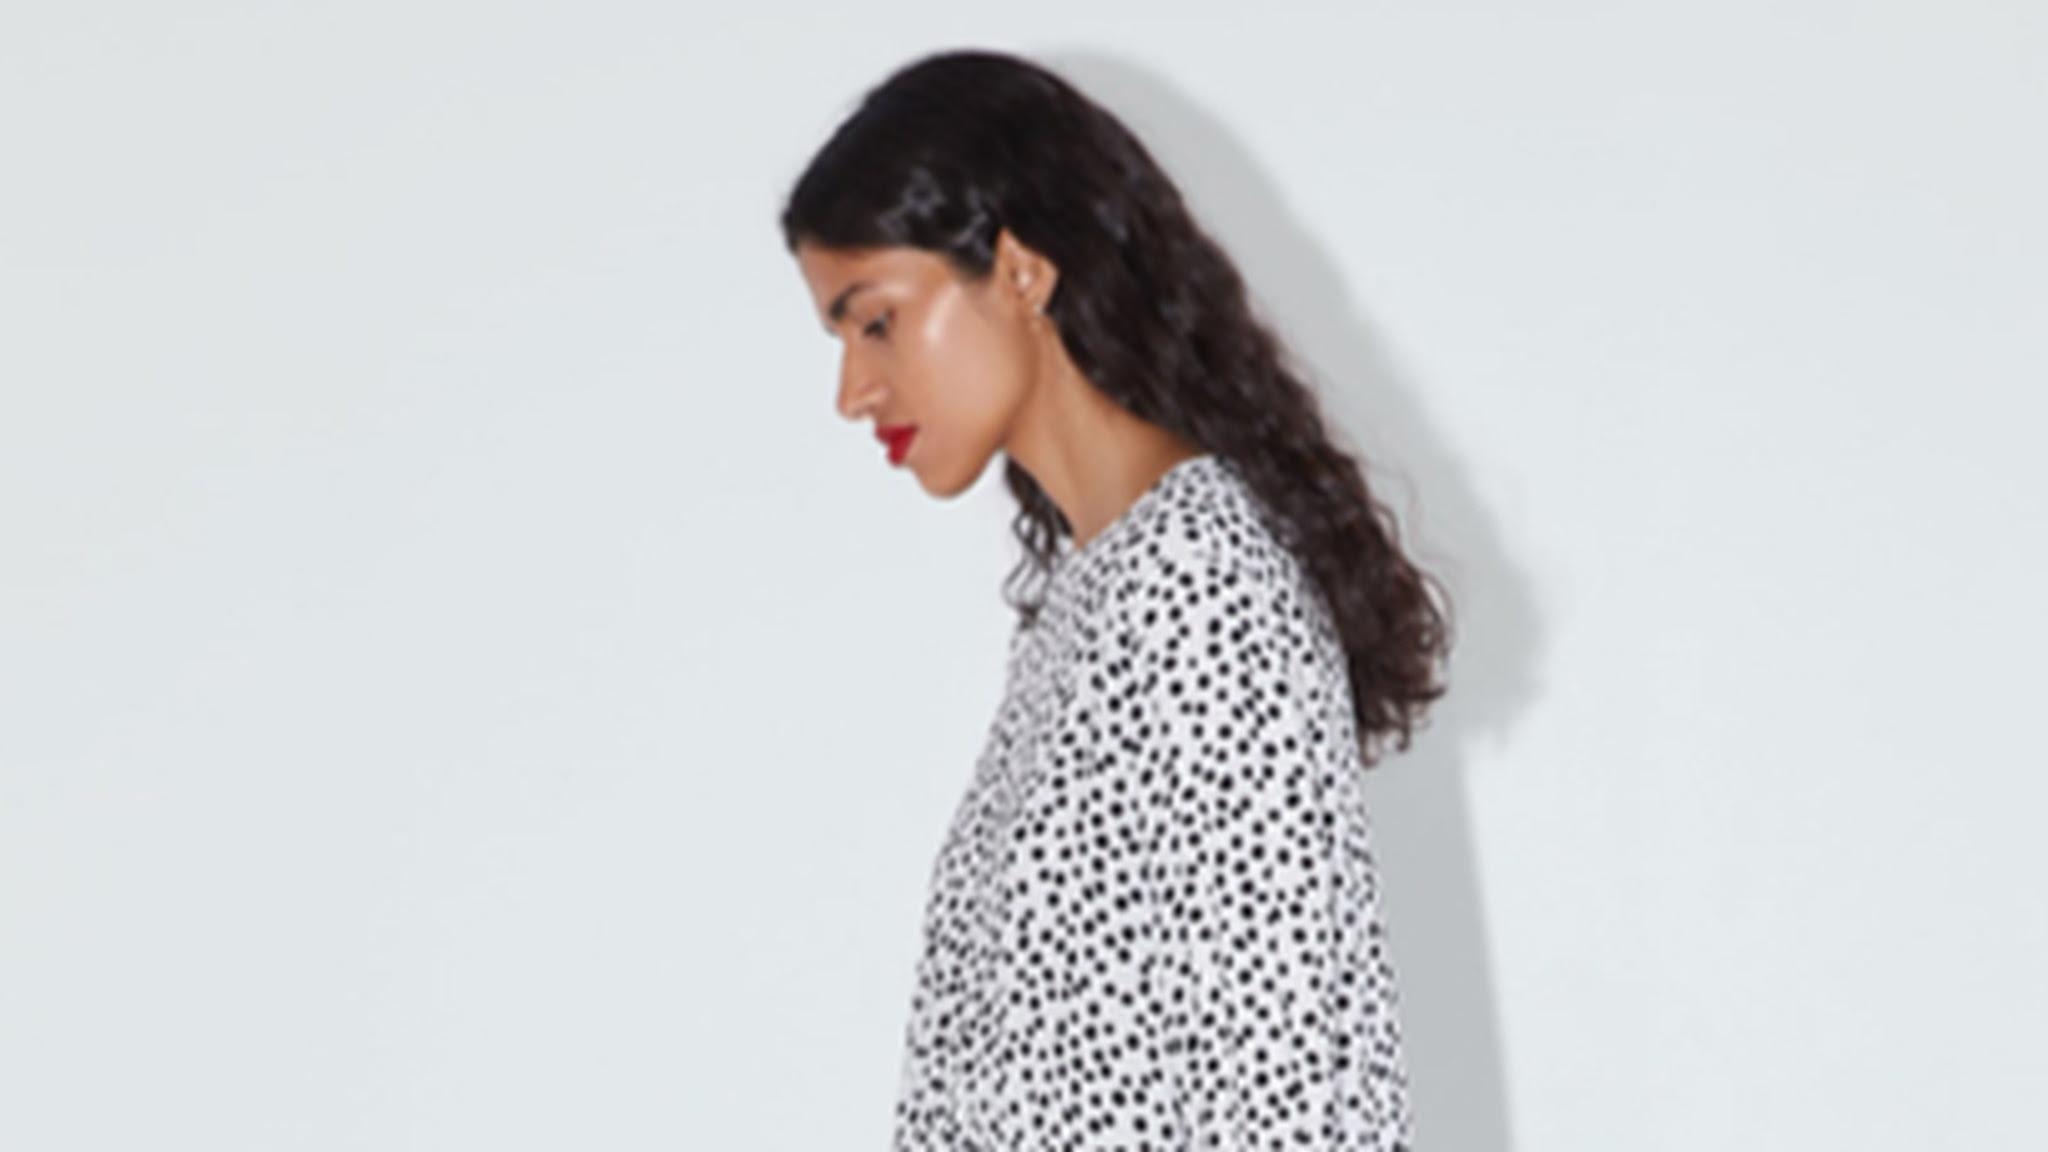 polka-dot dress boosts zara sales in tough retail market